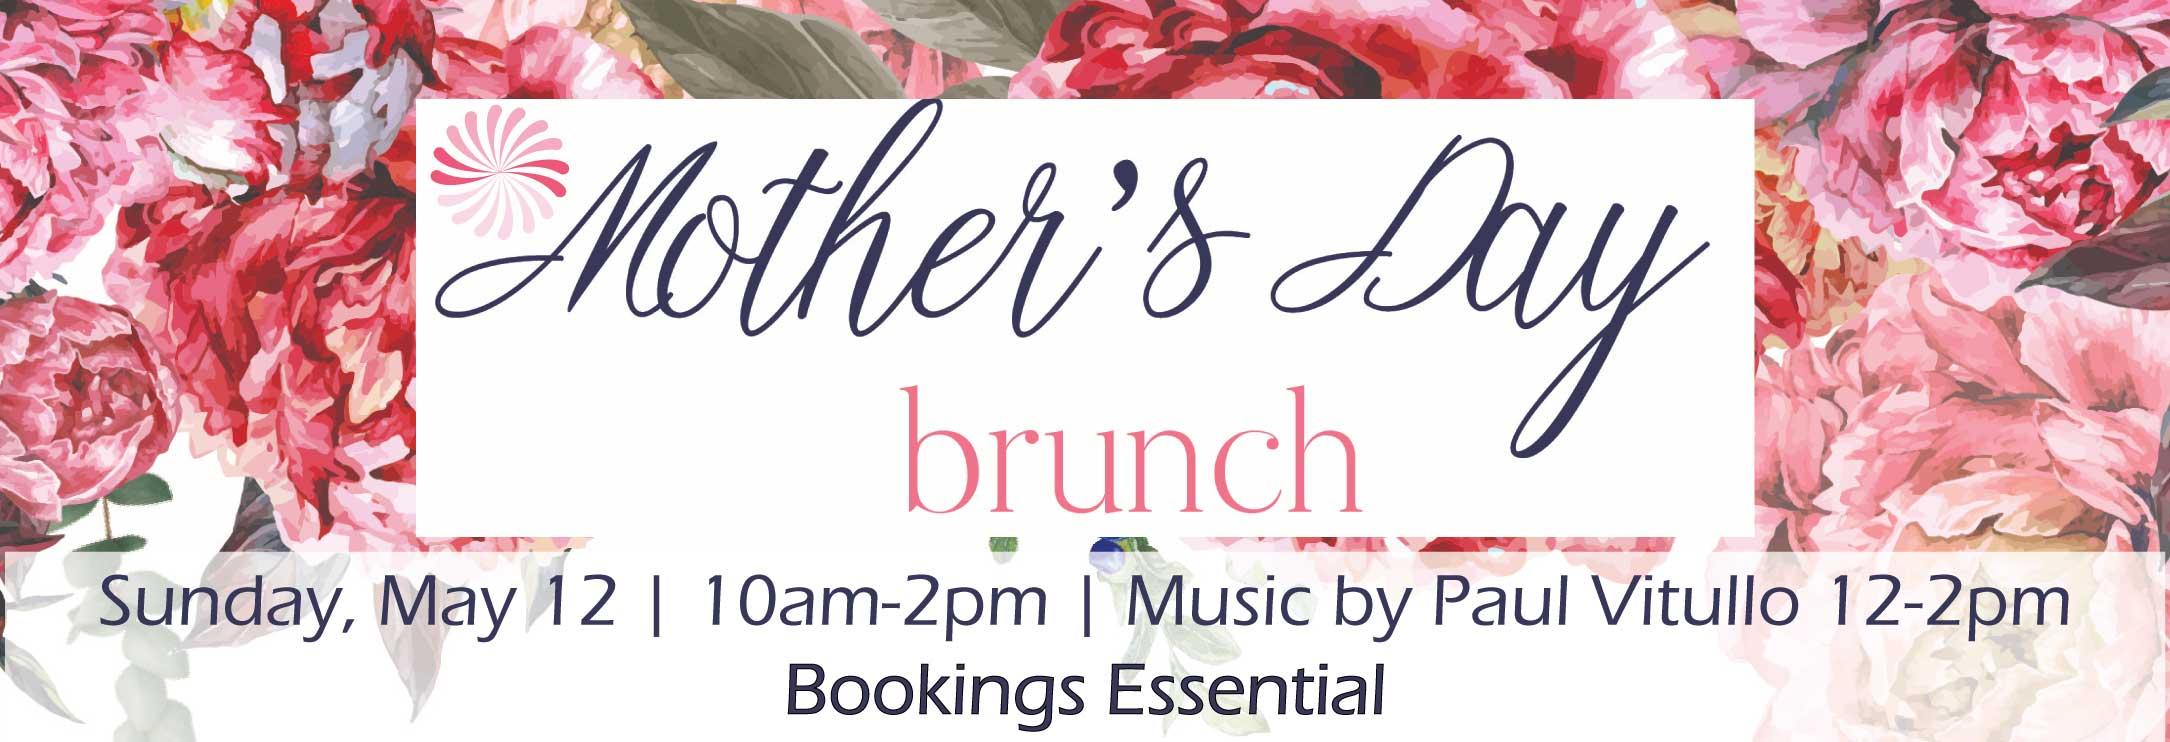 Mother's-Day-Brunch-2019-BANNER